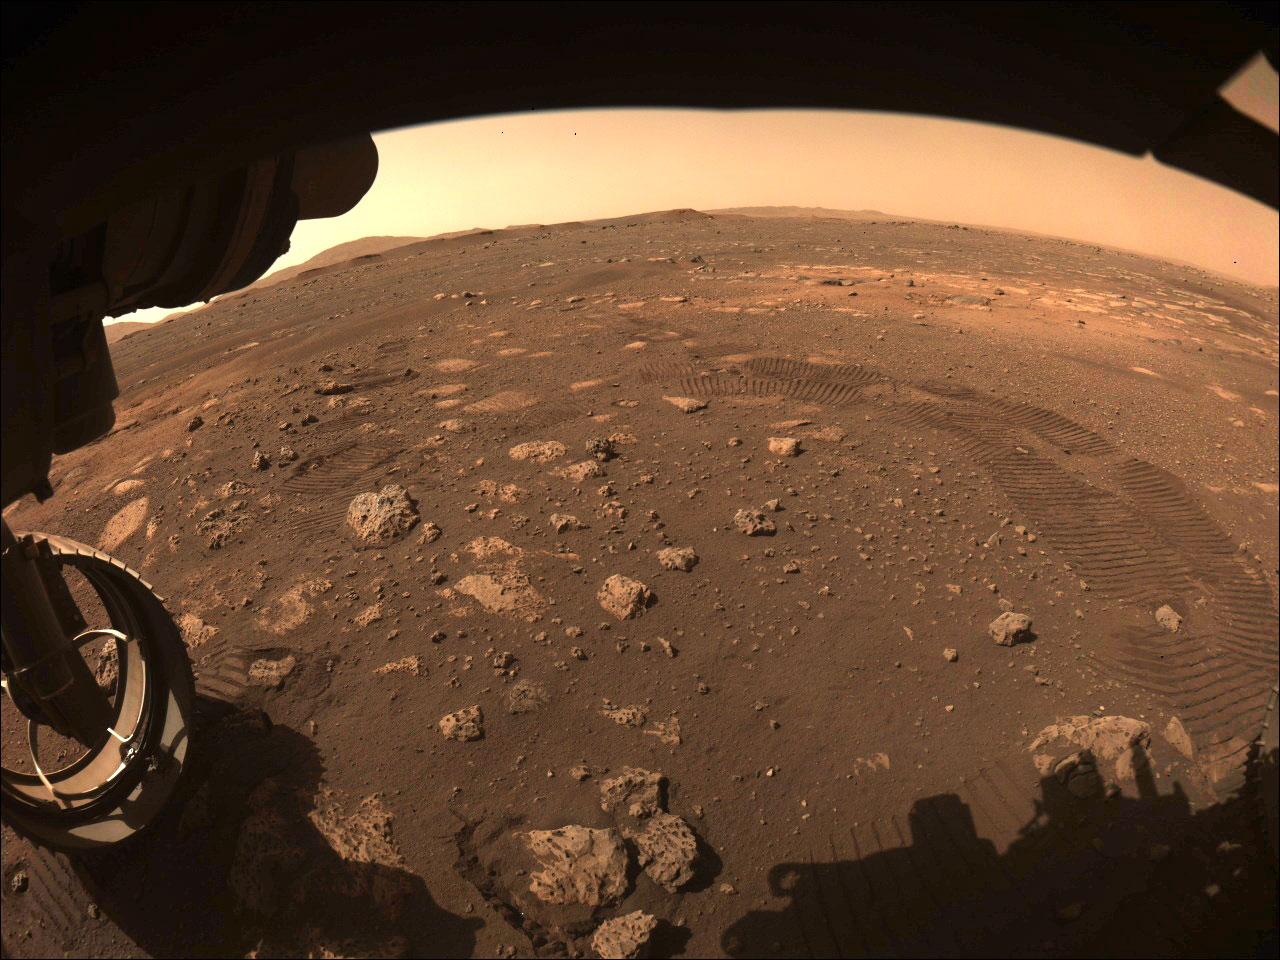 NASA火星探査車が岩石のサンプル採取に成功、史上初